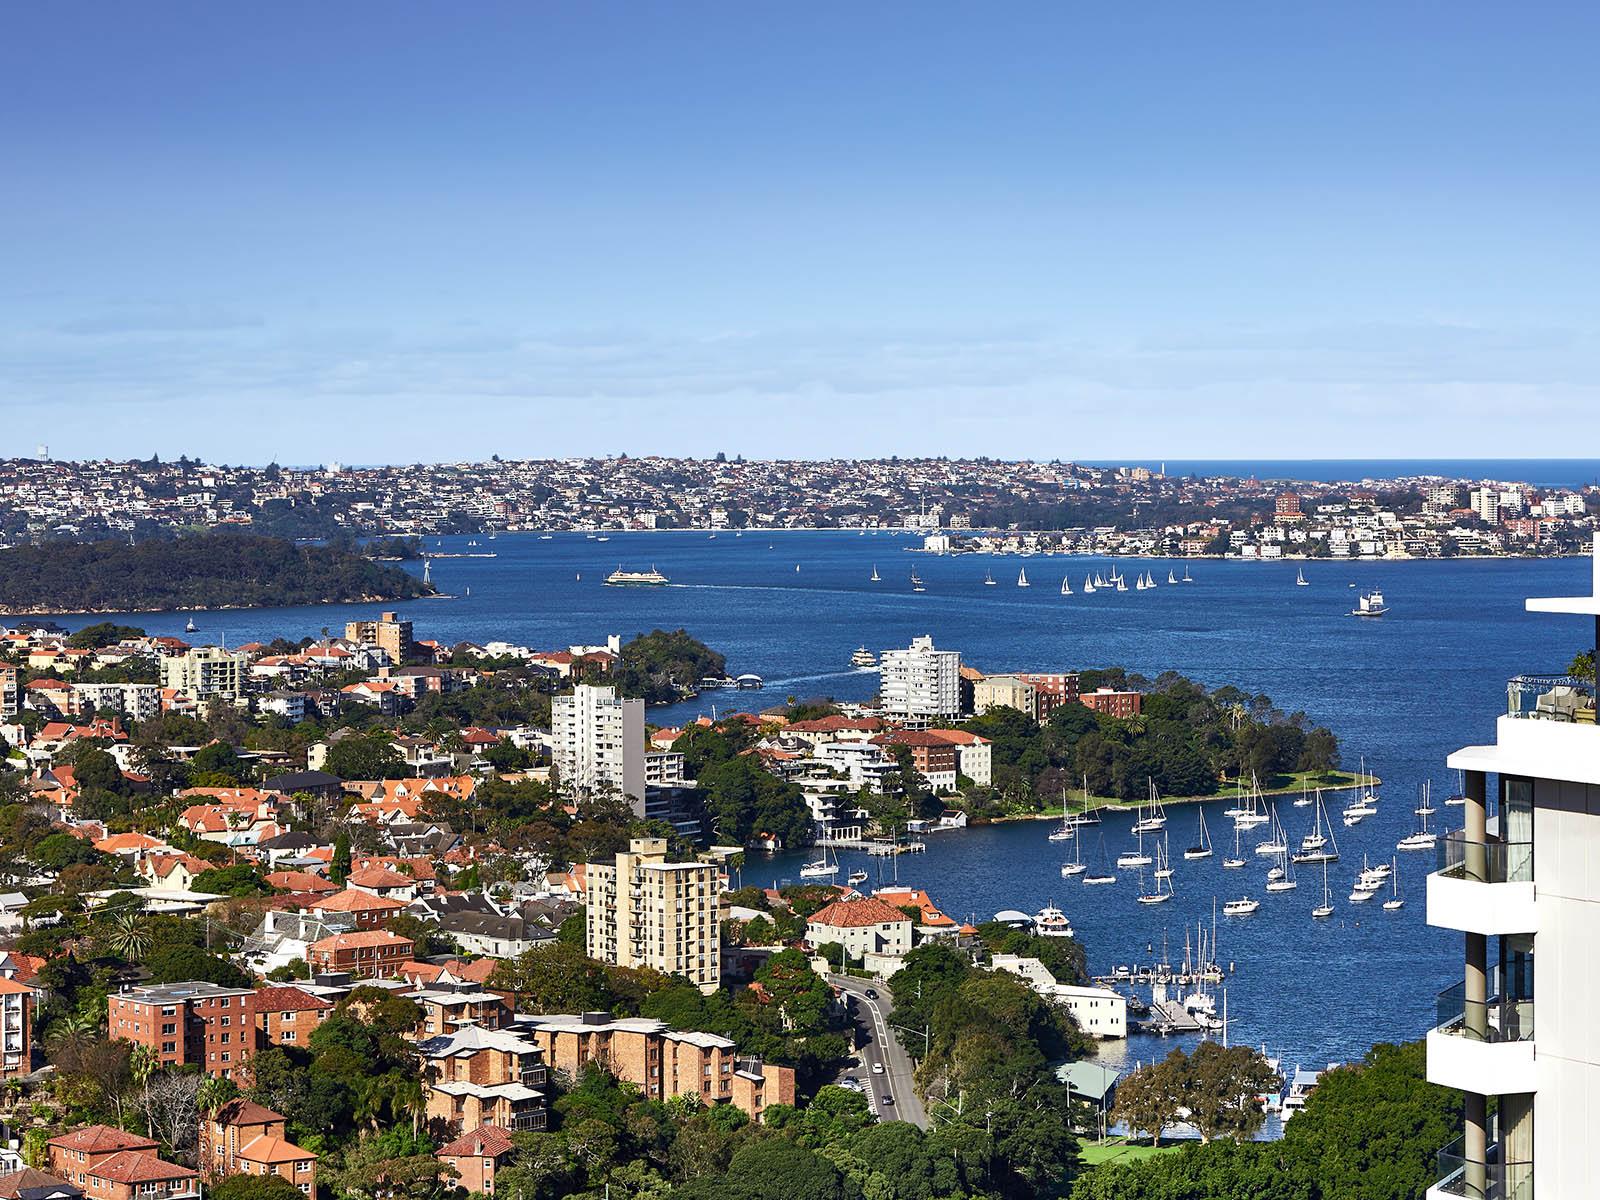 Apartment - 229-Miller-Street--North-Sydney-2060 - CBRE ...